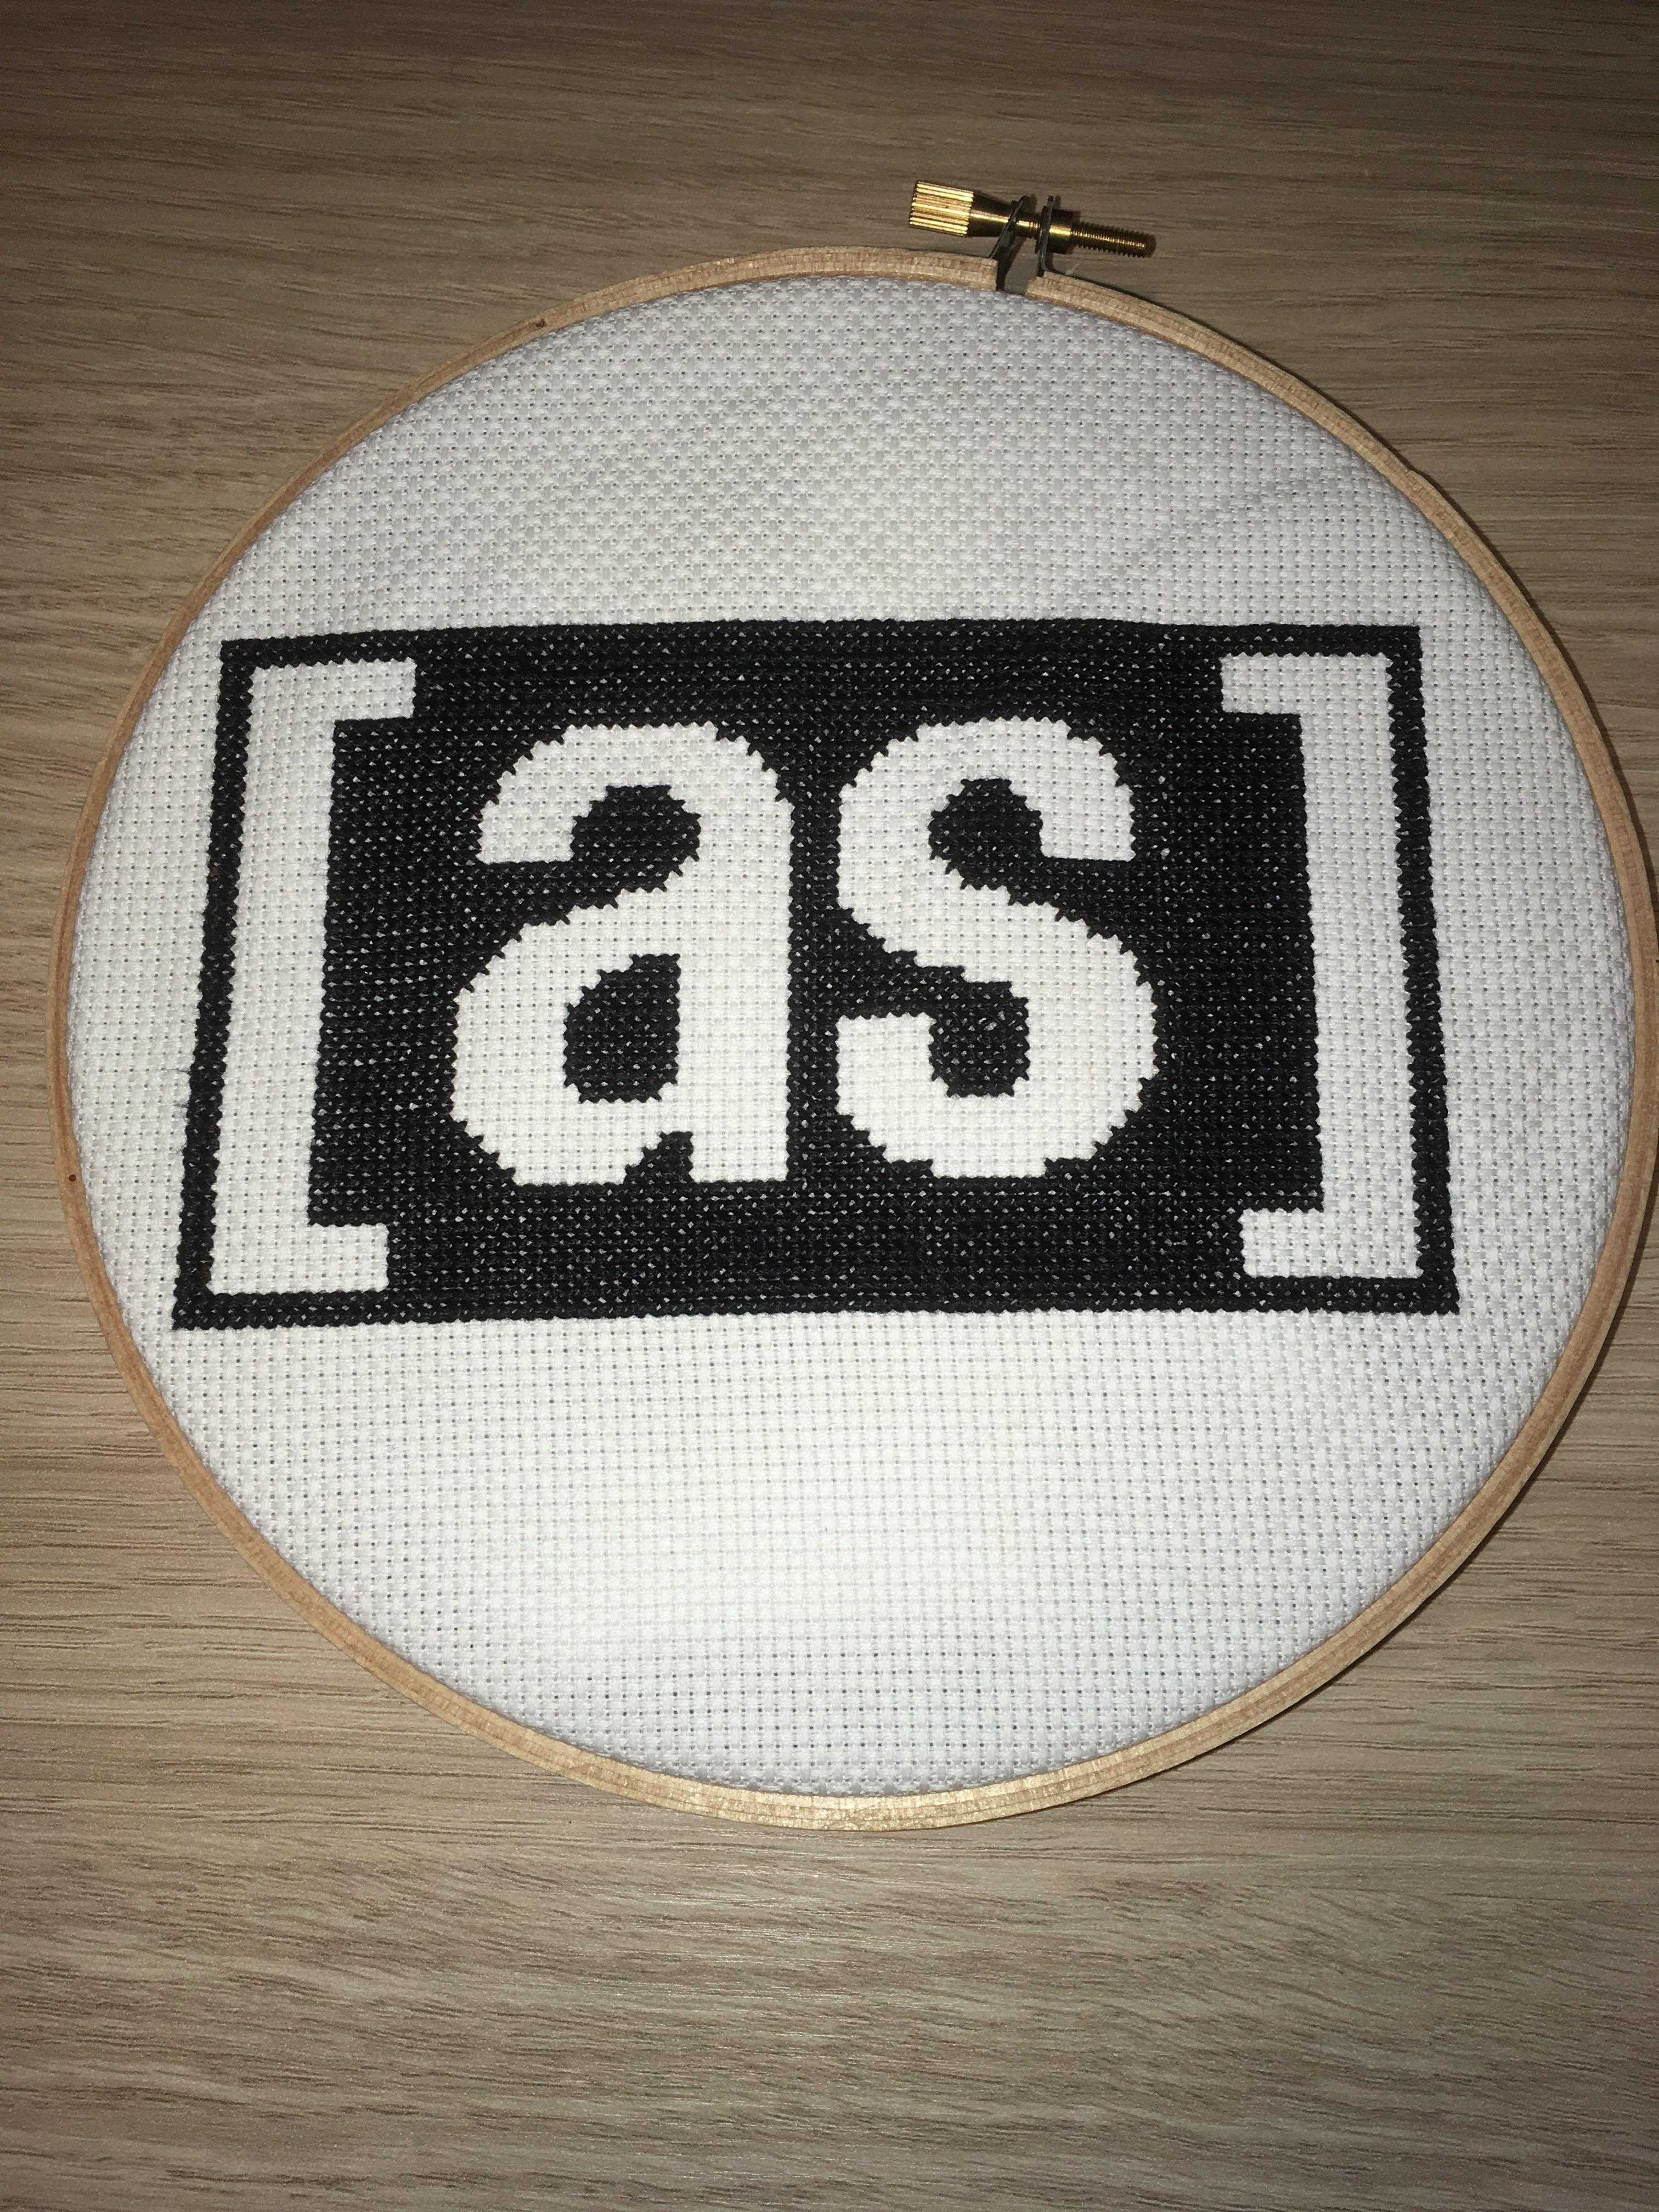 My adult swim logo cross stitch : adultswim.